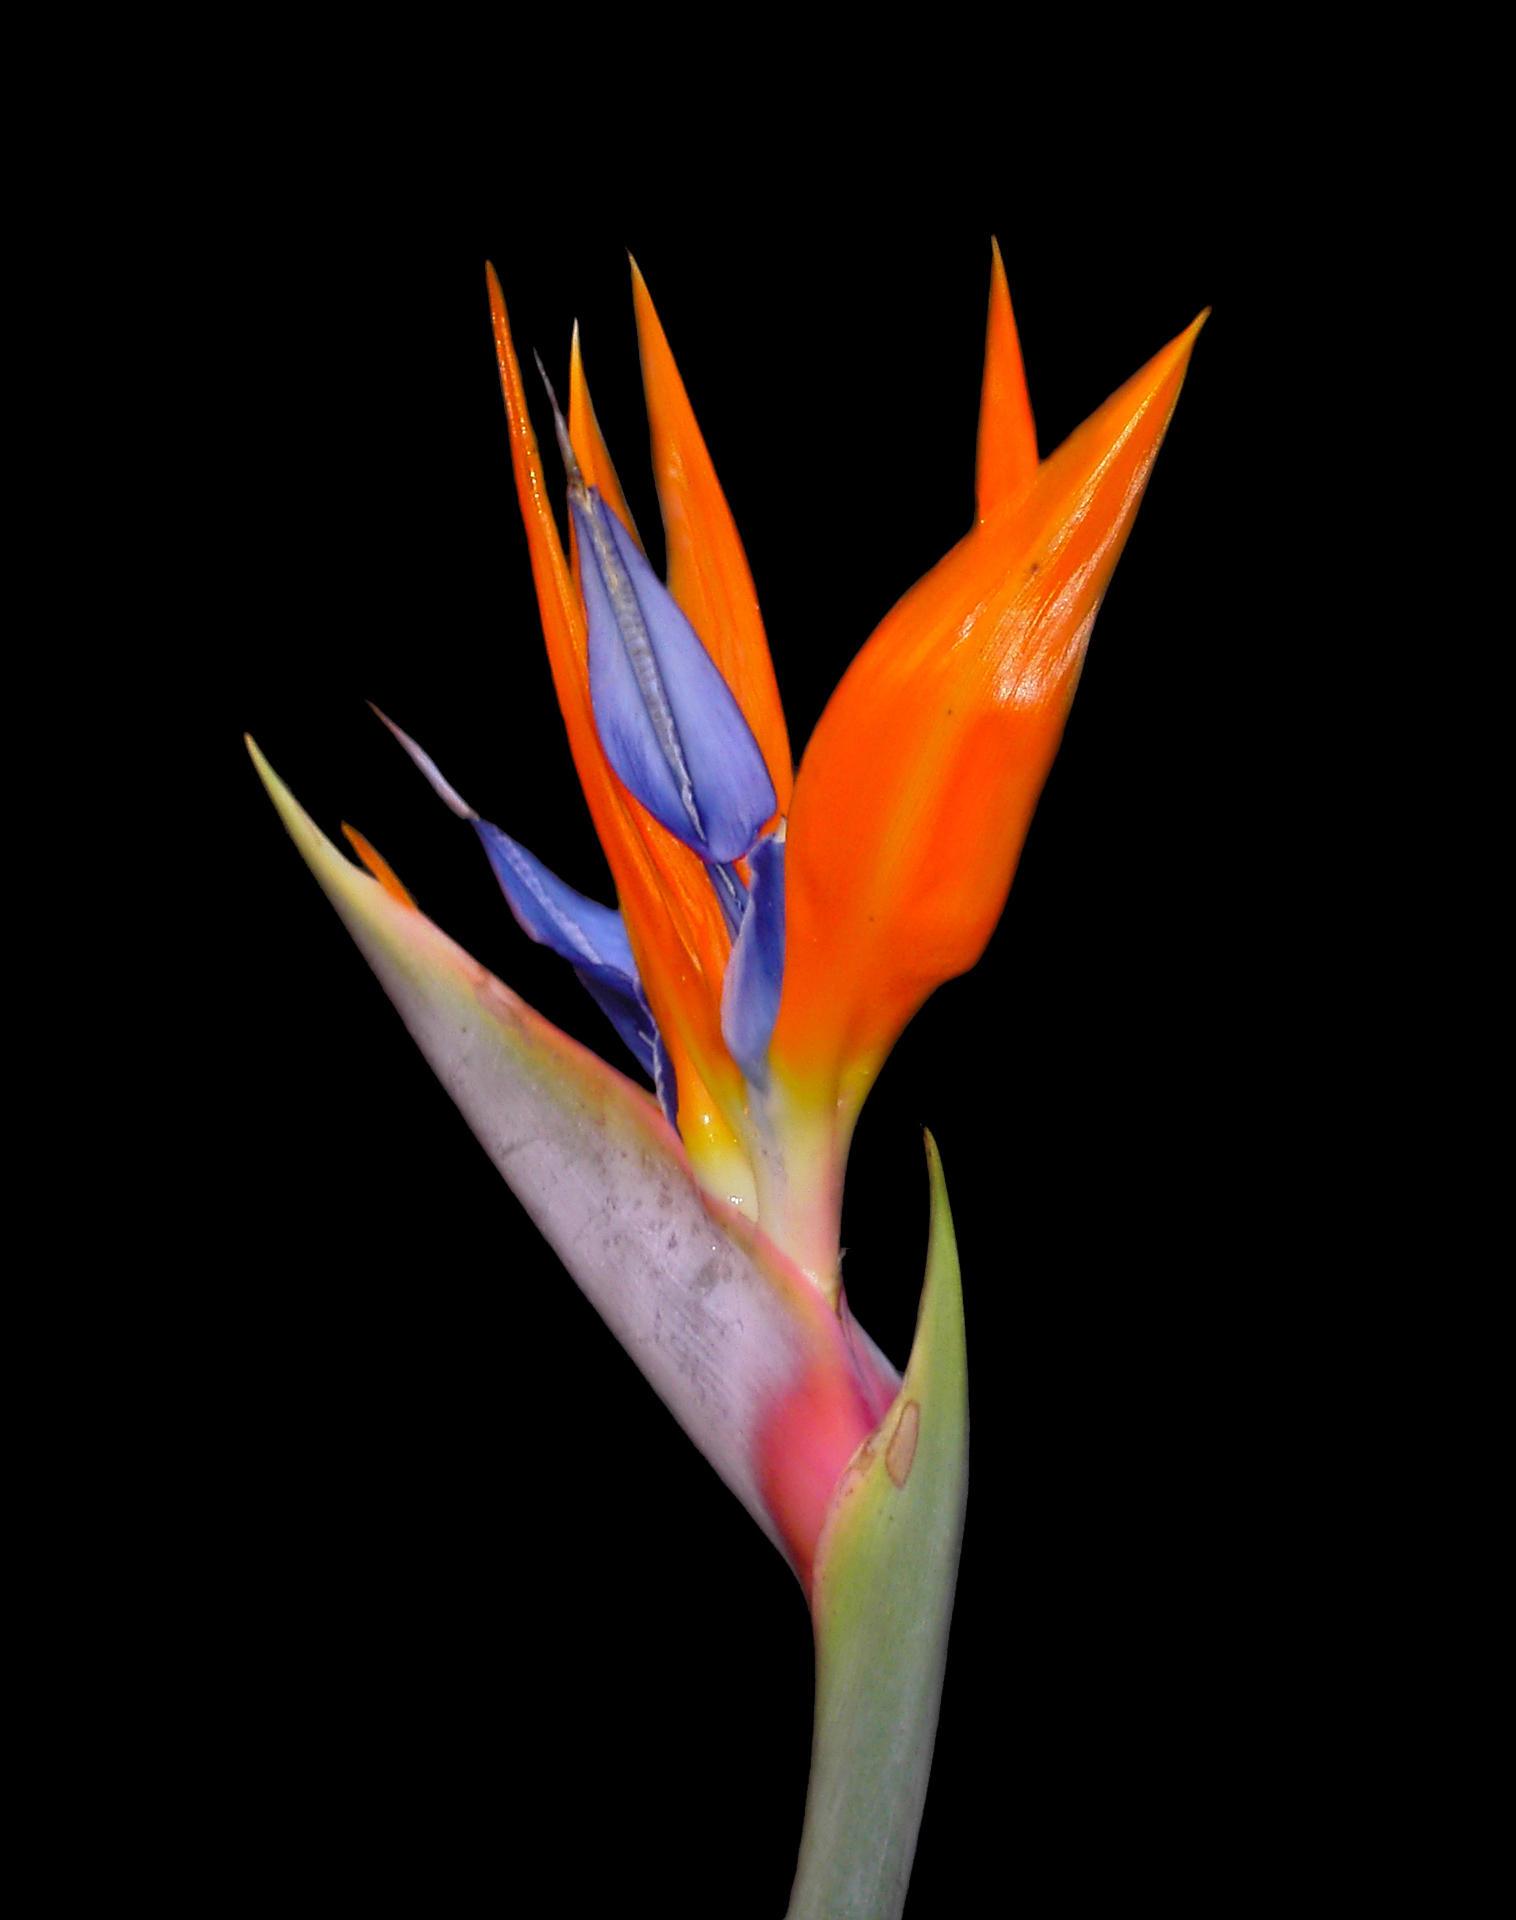 The bird of paradise by tsana on deviantart - Hd images of birds of paradise ...